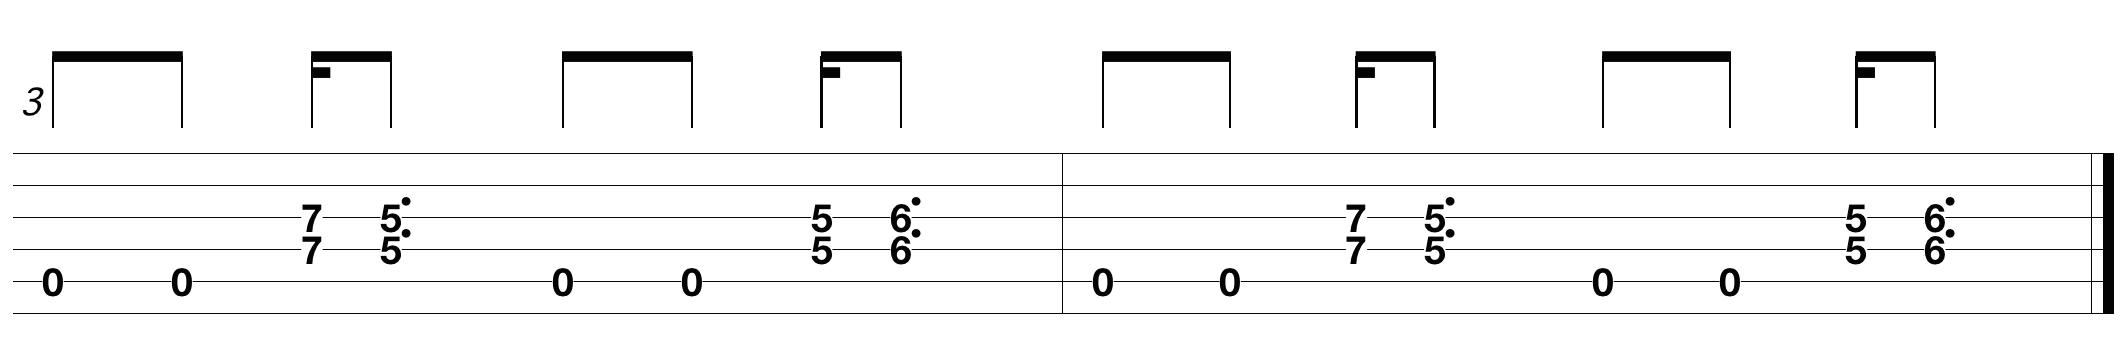 easy-rock-guitar-riffs_3.png